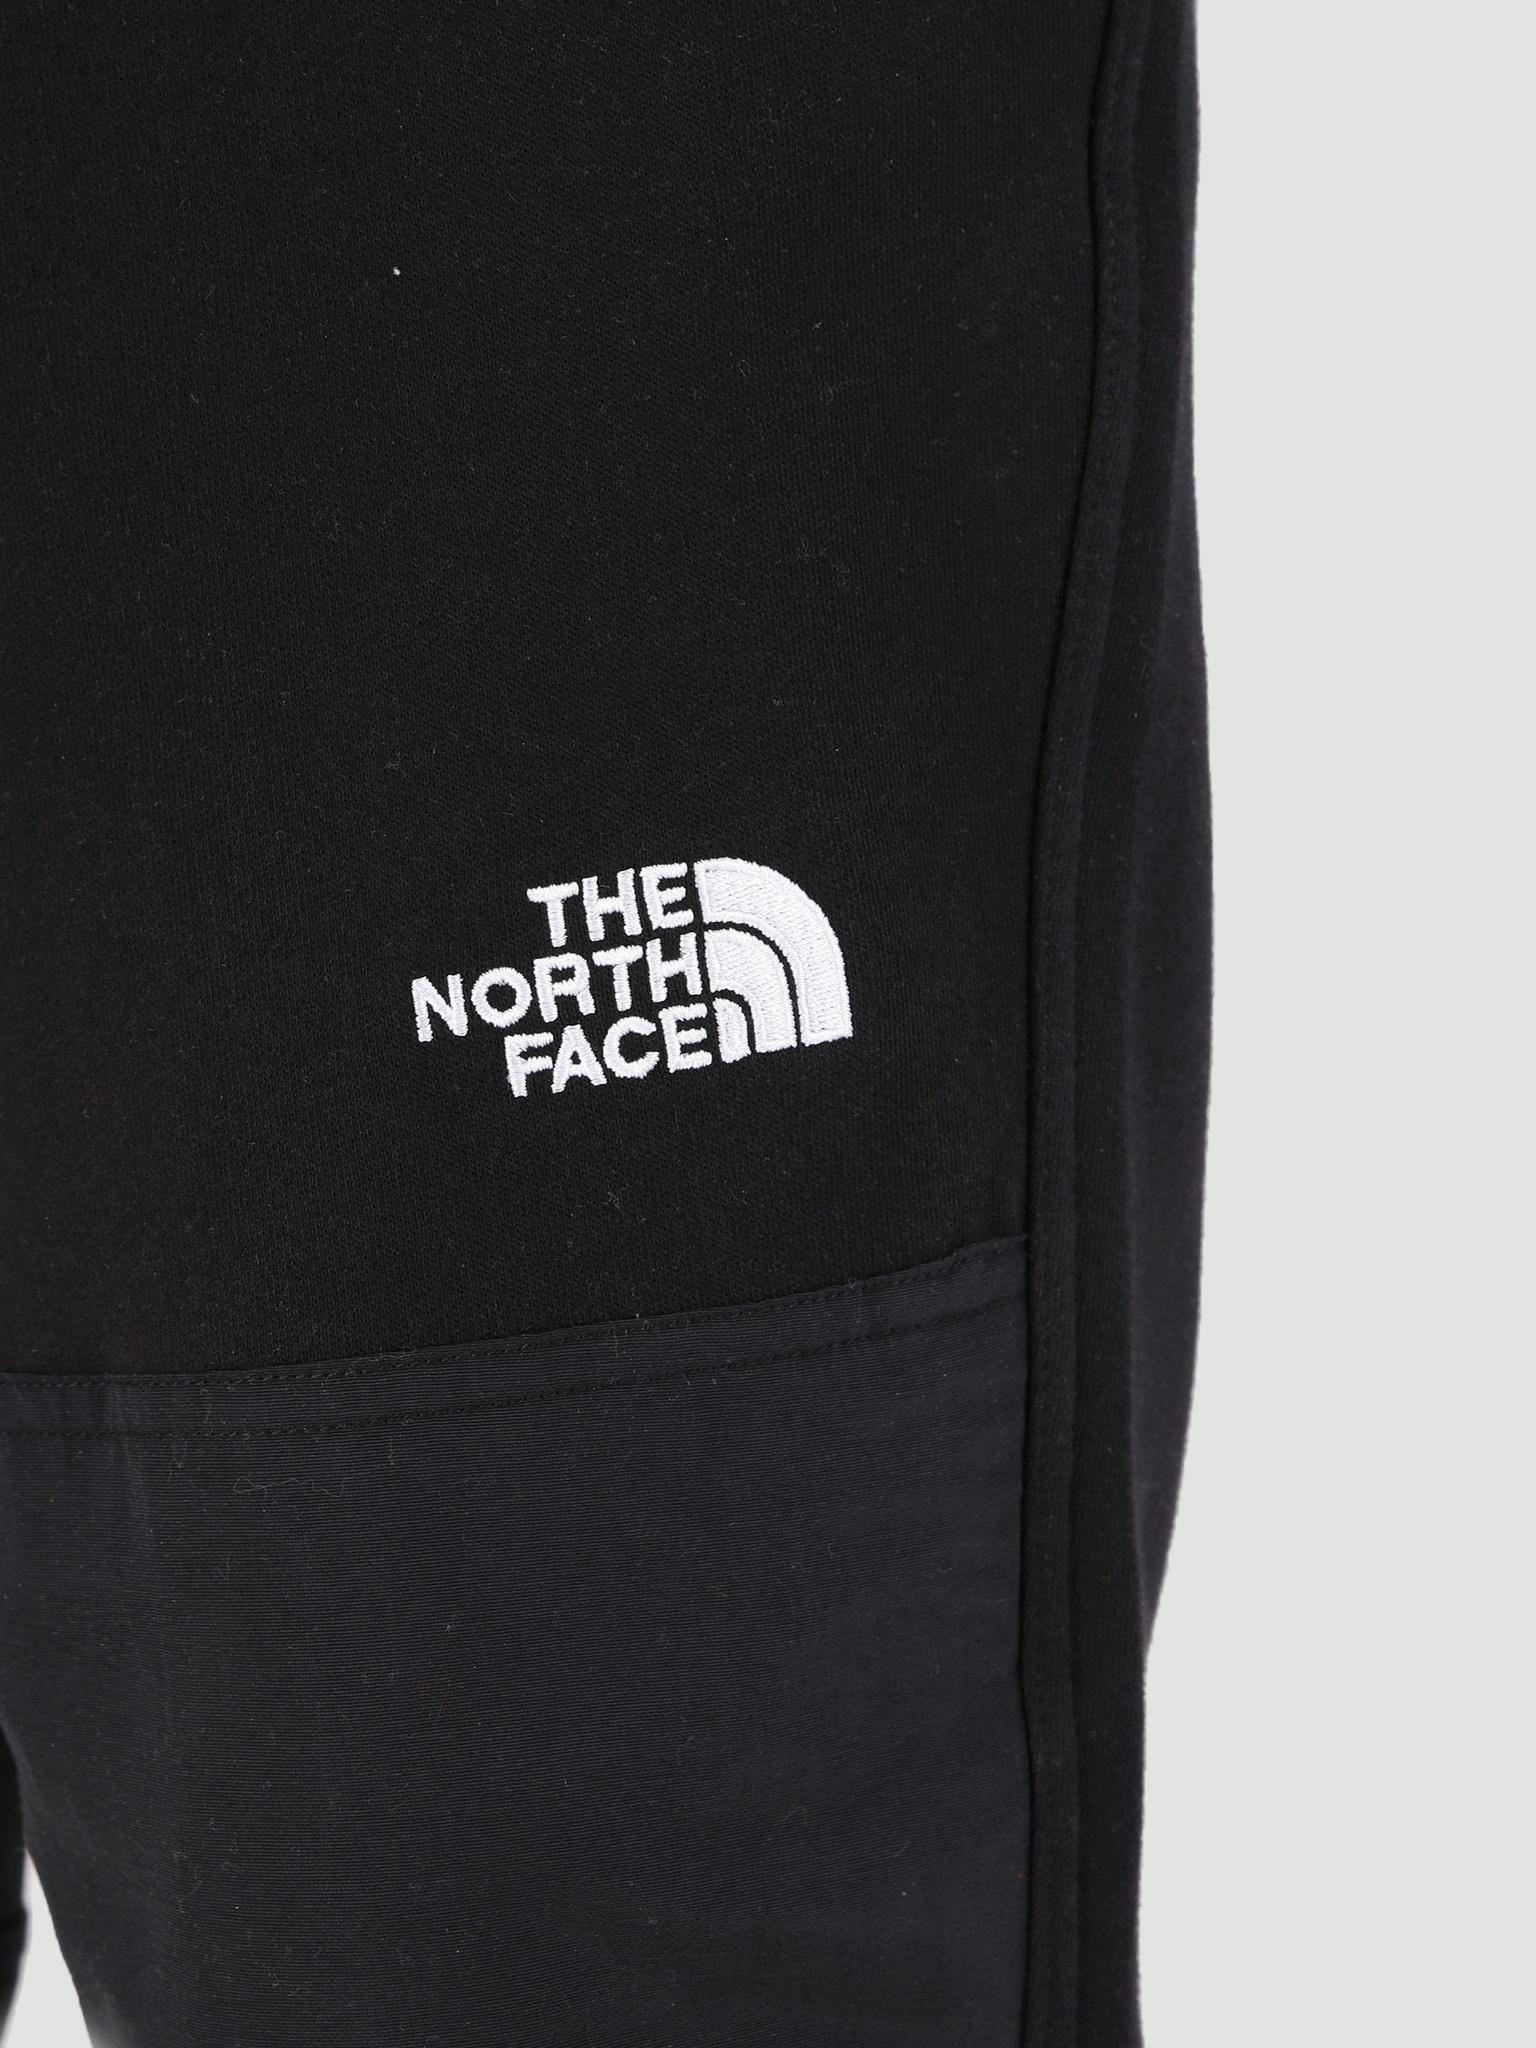 The North Face The North Face 92 Rage Fleece Pnt TNF Black T93MJ2JK3